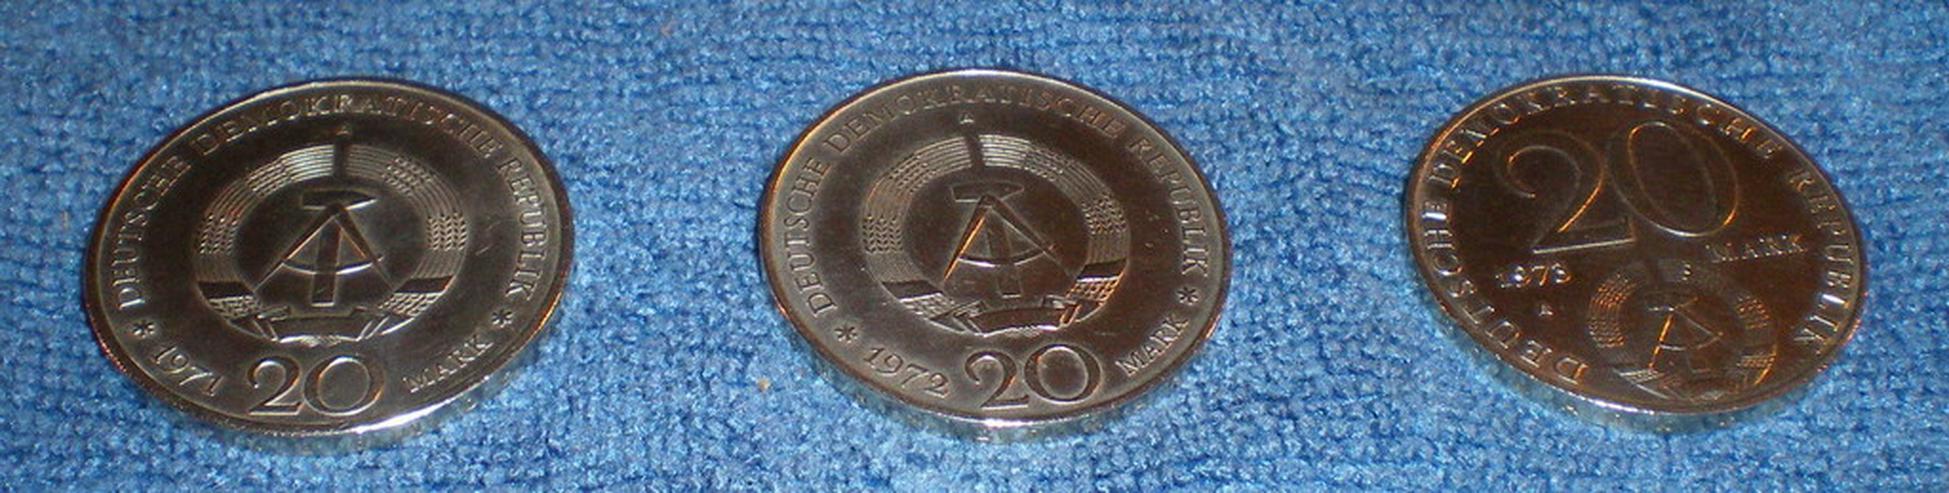 Bild 5: Münzen DDR 20 Mark Stücke (Gedenkmünzen) (FP)